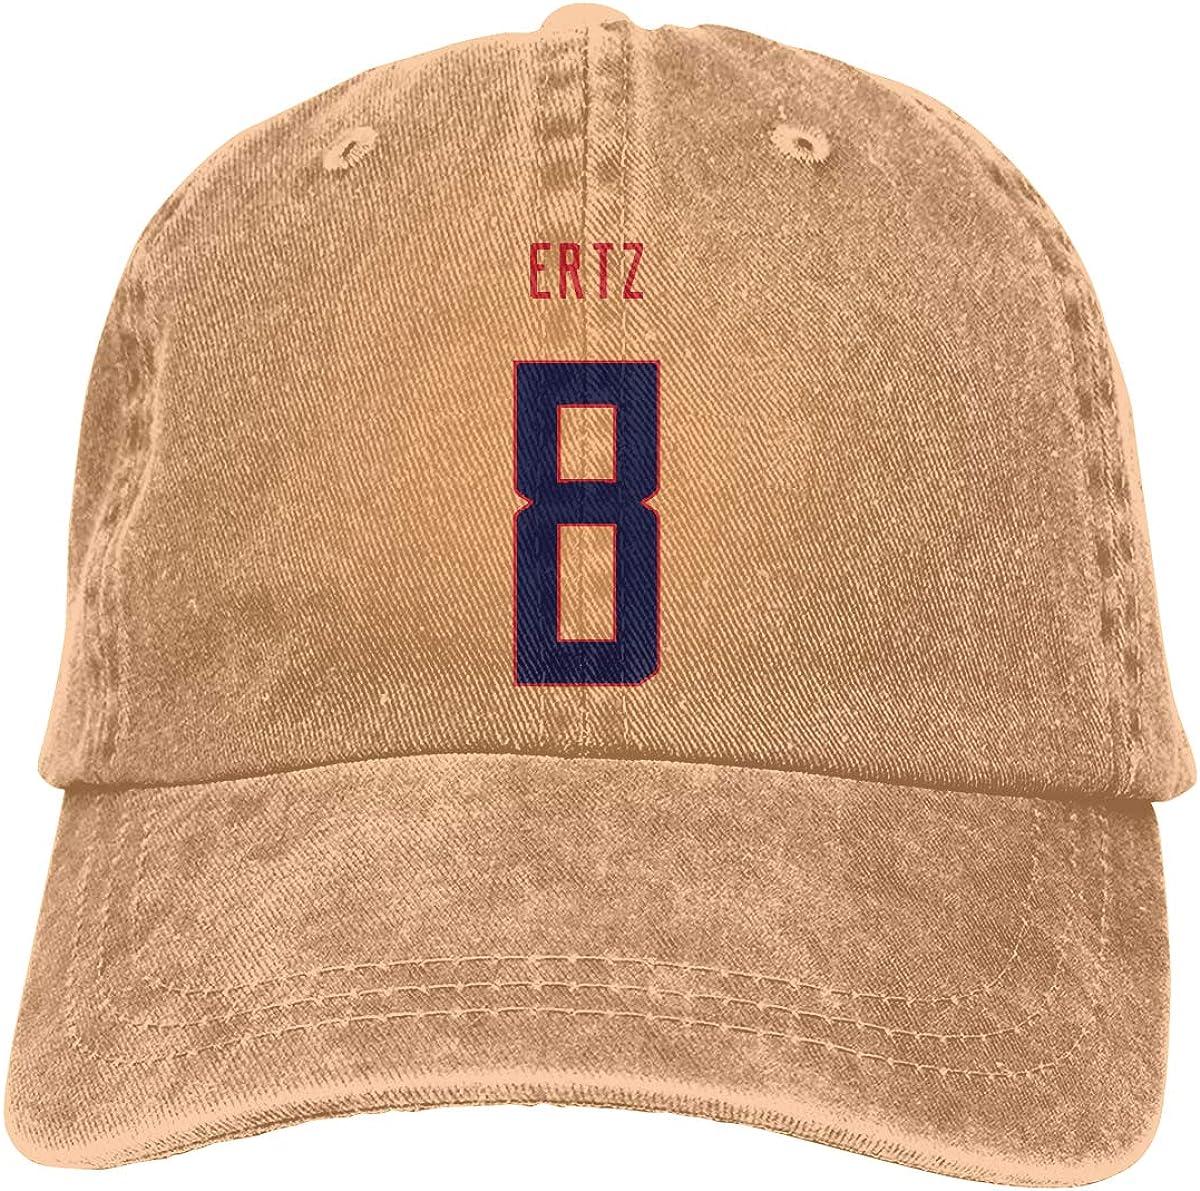 Unisex Adjustable Baseball Caps Julie-Ertz-Red-Logo Cowboy Skull Cap